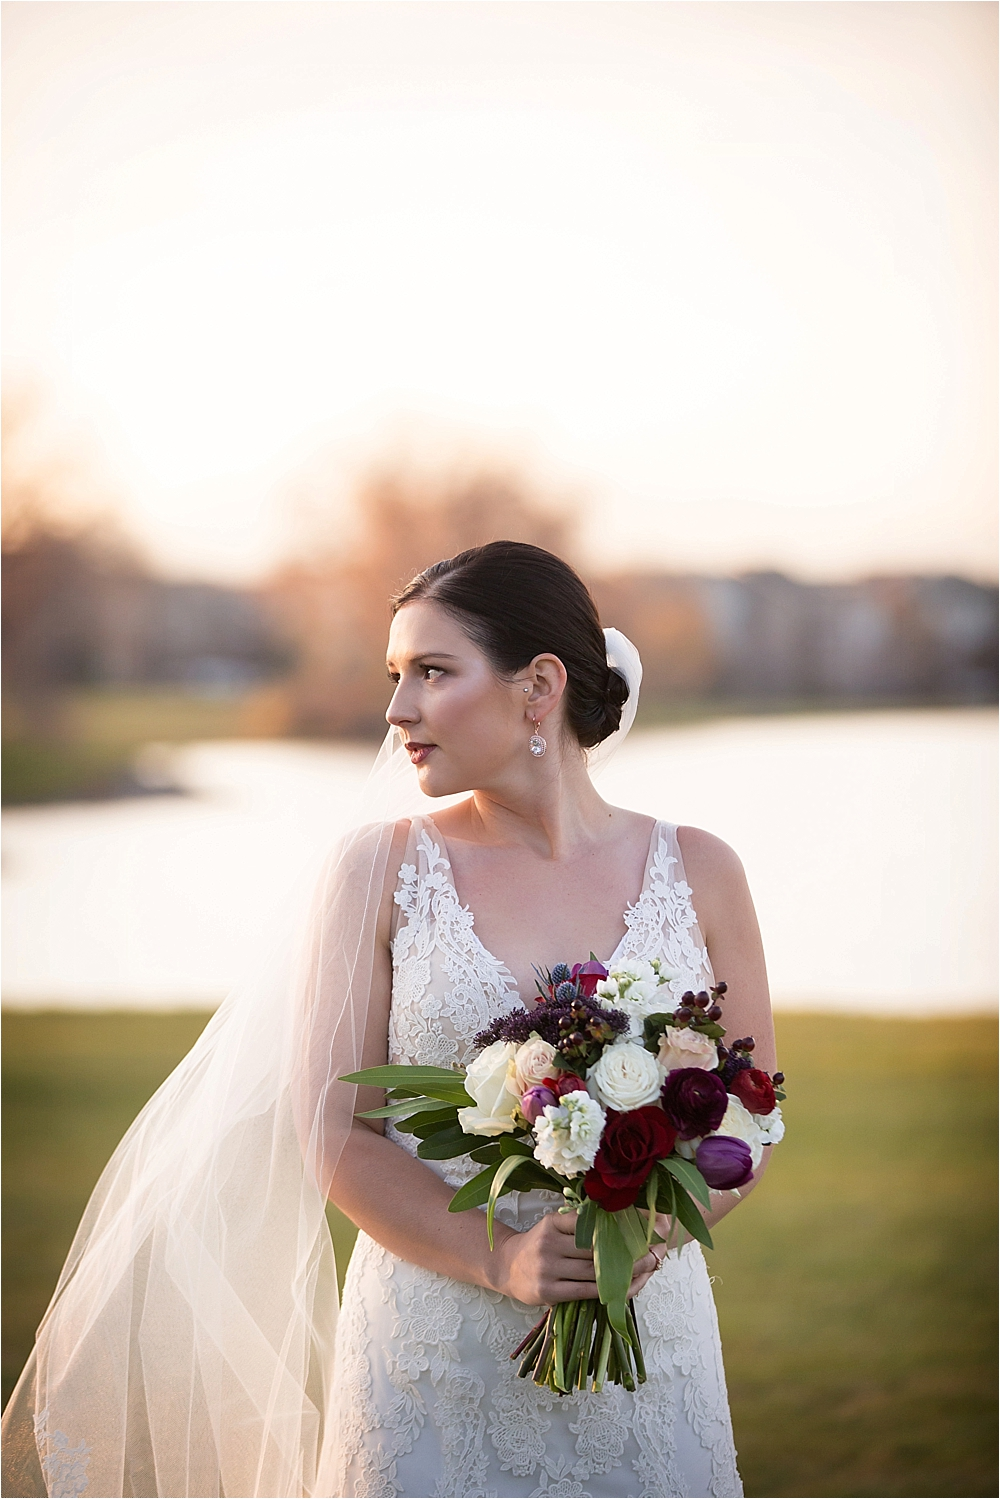 Lynsee + Deryk's Raccoon Creek Wedding_0032.jpg